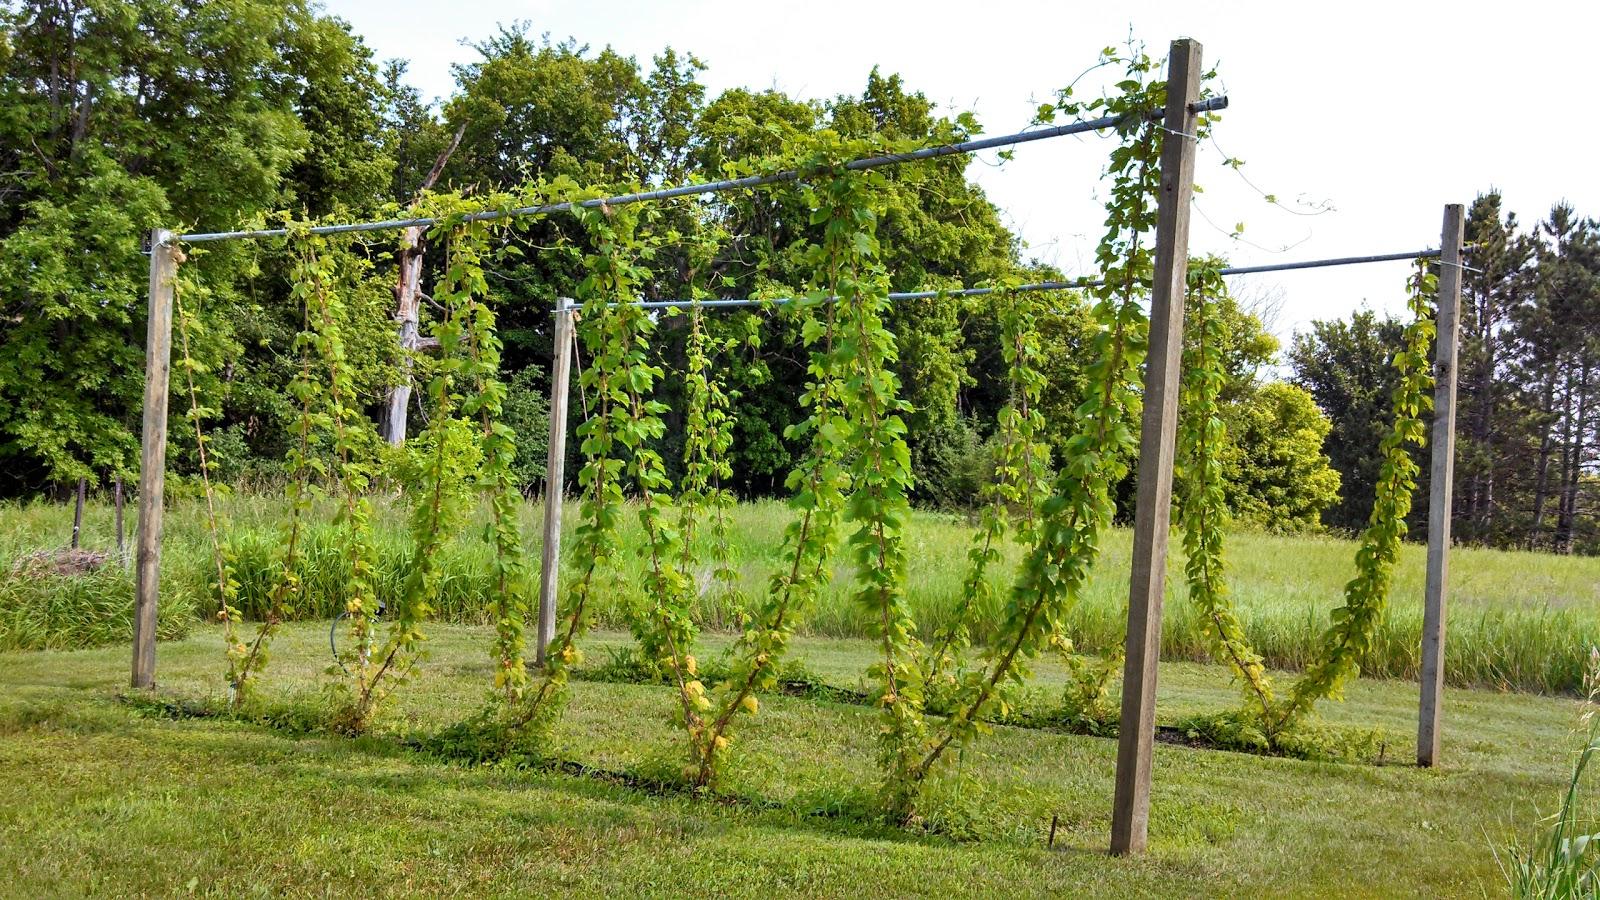 Fluke brewing minnesota homebrewing hop growing diy for Hops garden designs